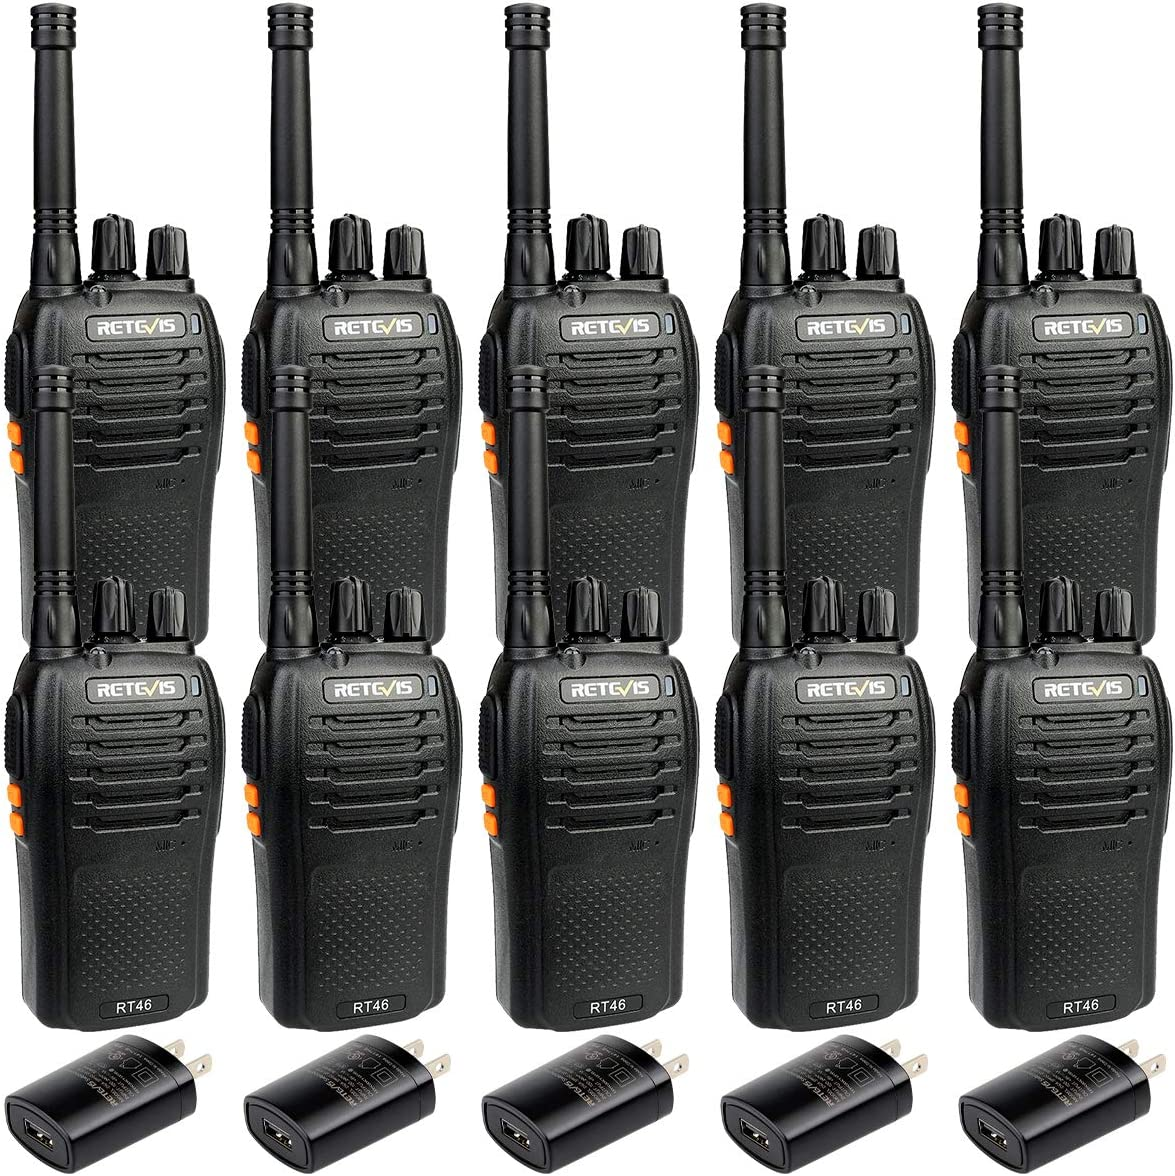 Retevis RT46 Walkie Talkies Two Way Radio Long Range with Earpieces Emergency Flashlight SOS AA Dual Power VOX 2 Way Radio Rechargeable 10 Pack